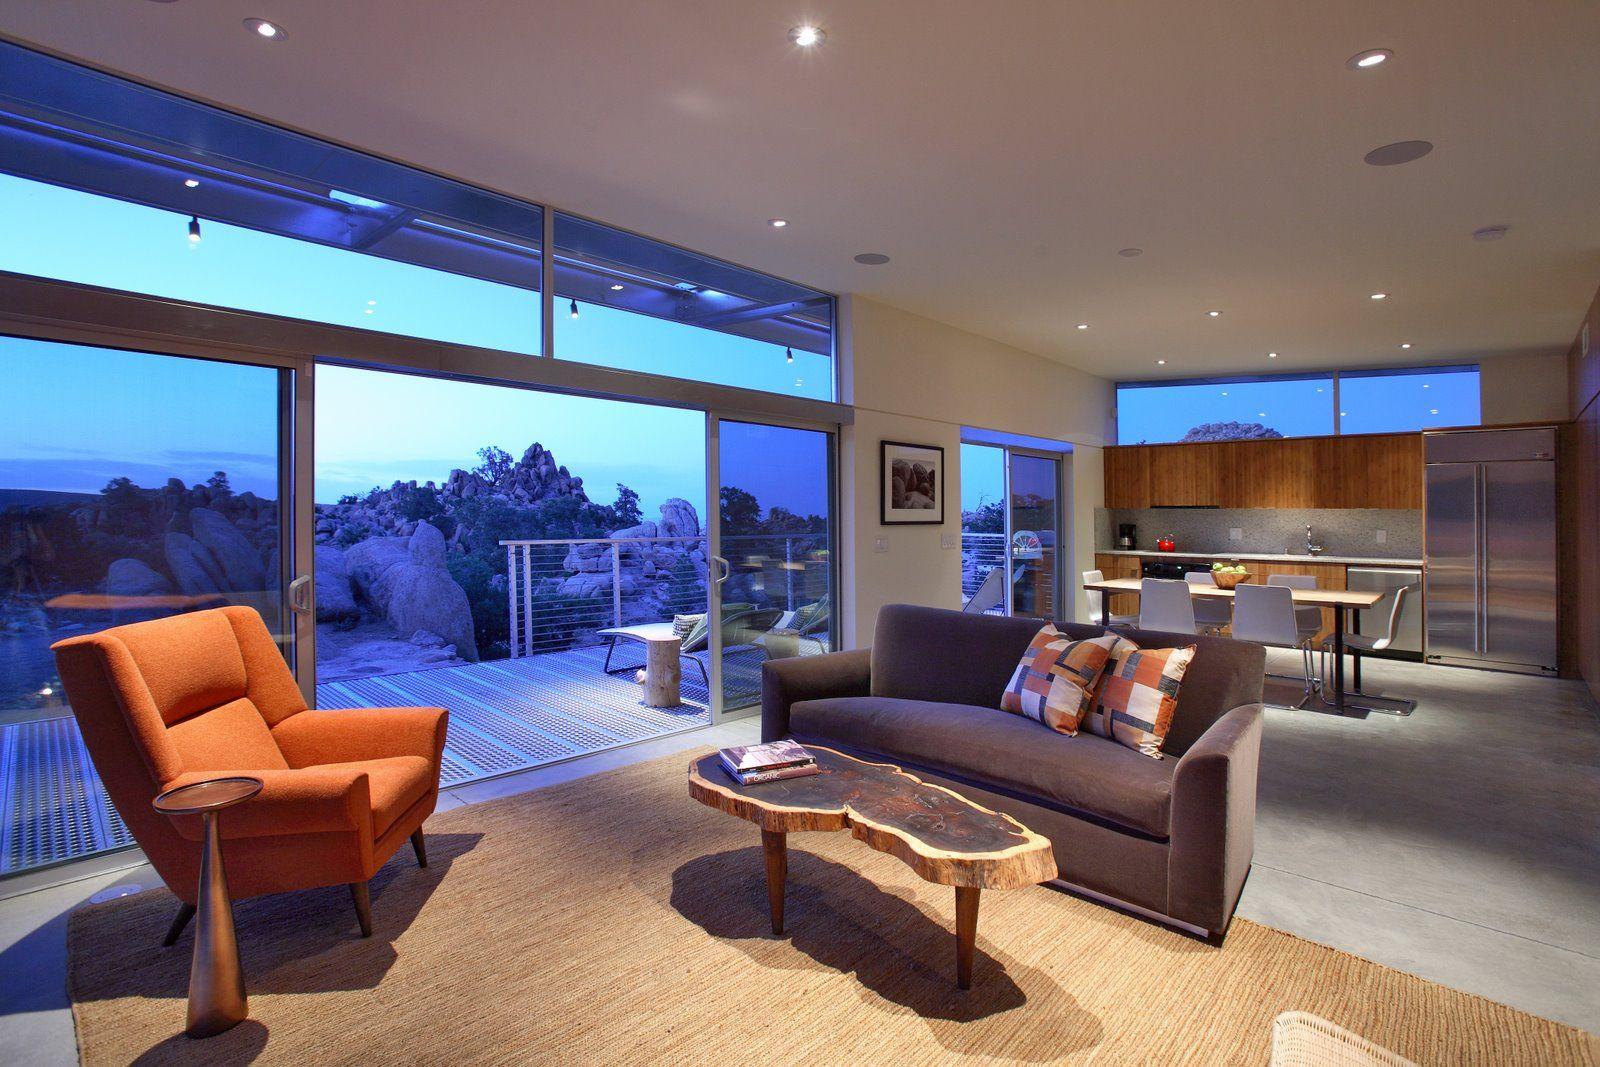 Blue Sky Homes schließt elegantes Stahlfertighaus ab in